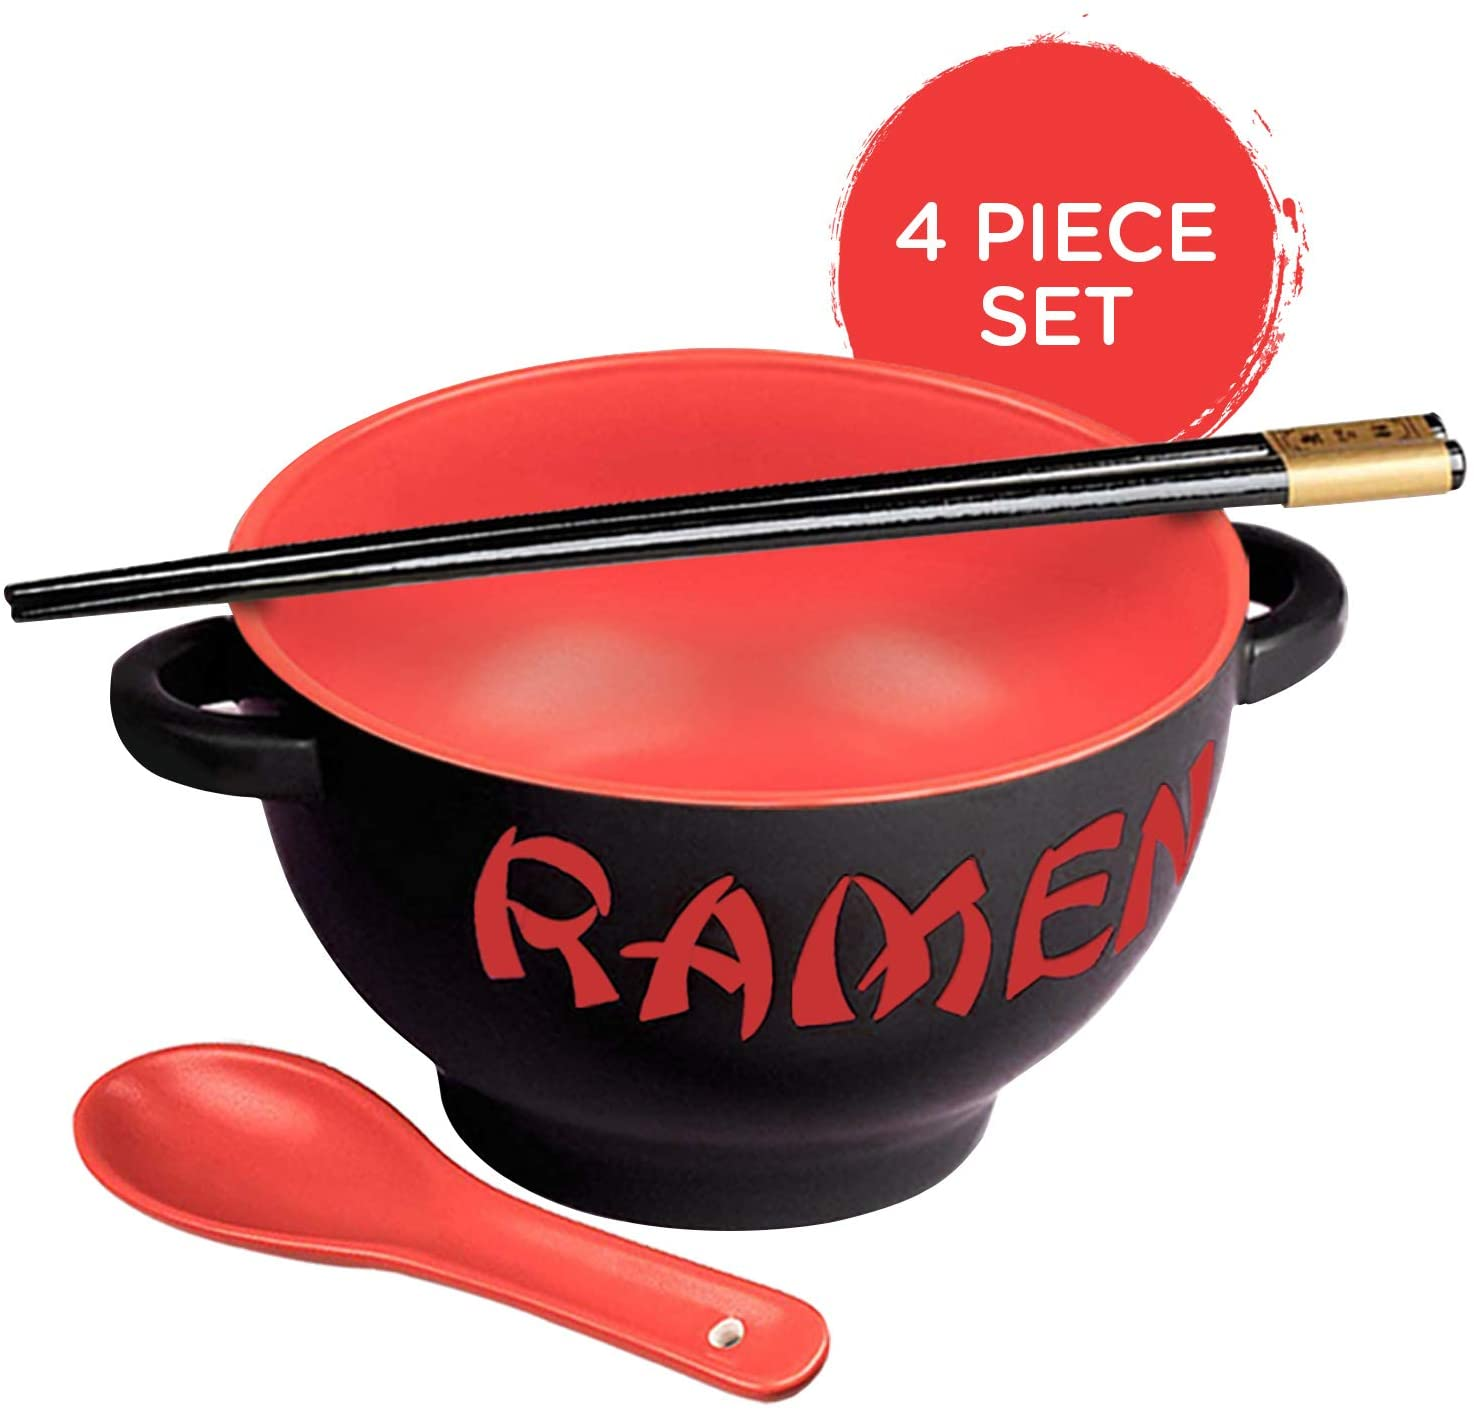 World Market Japanese Ceramic Ramen Bowl Set - 4 Piece Red Dragon Noodle Bowl with Soup Spoon and Chopstick - Soup Bowls for Noodle Soup, Ramen, Udon, Miso, Thai, Curry, Soba, Pho Soup - 17 Ounce